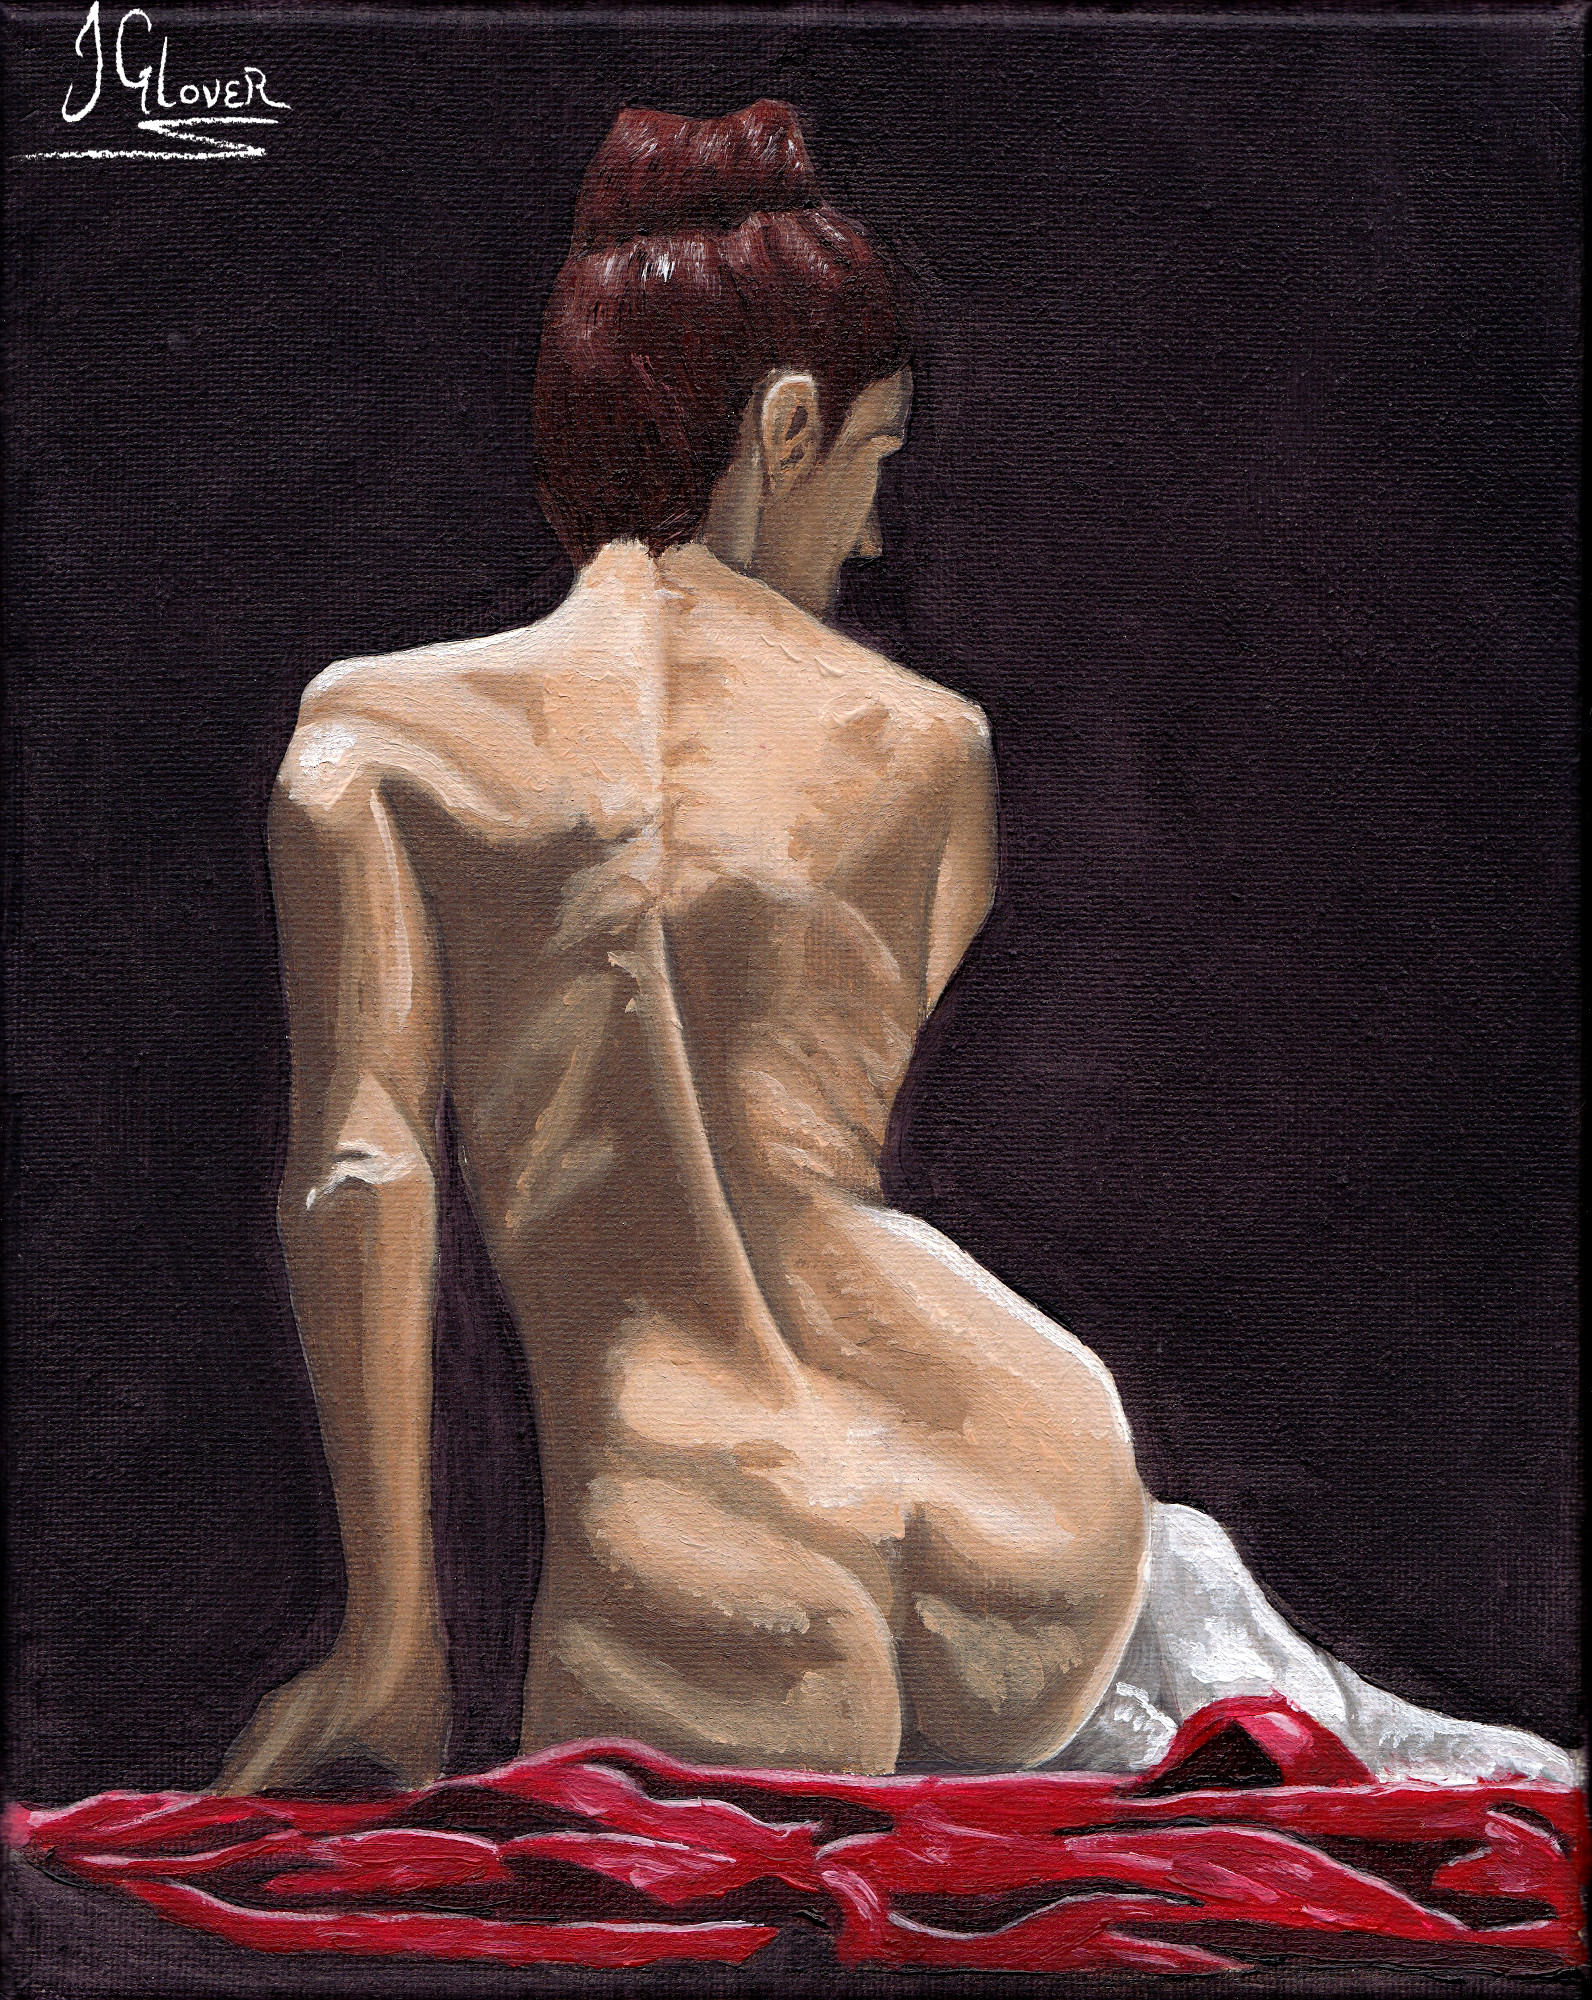 Nude Geisha Girl Model Life Drawing Painting Figure Study Art